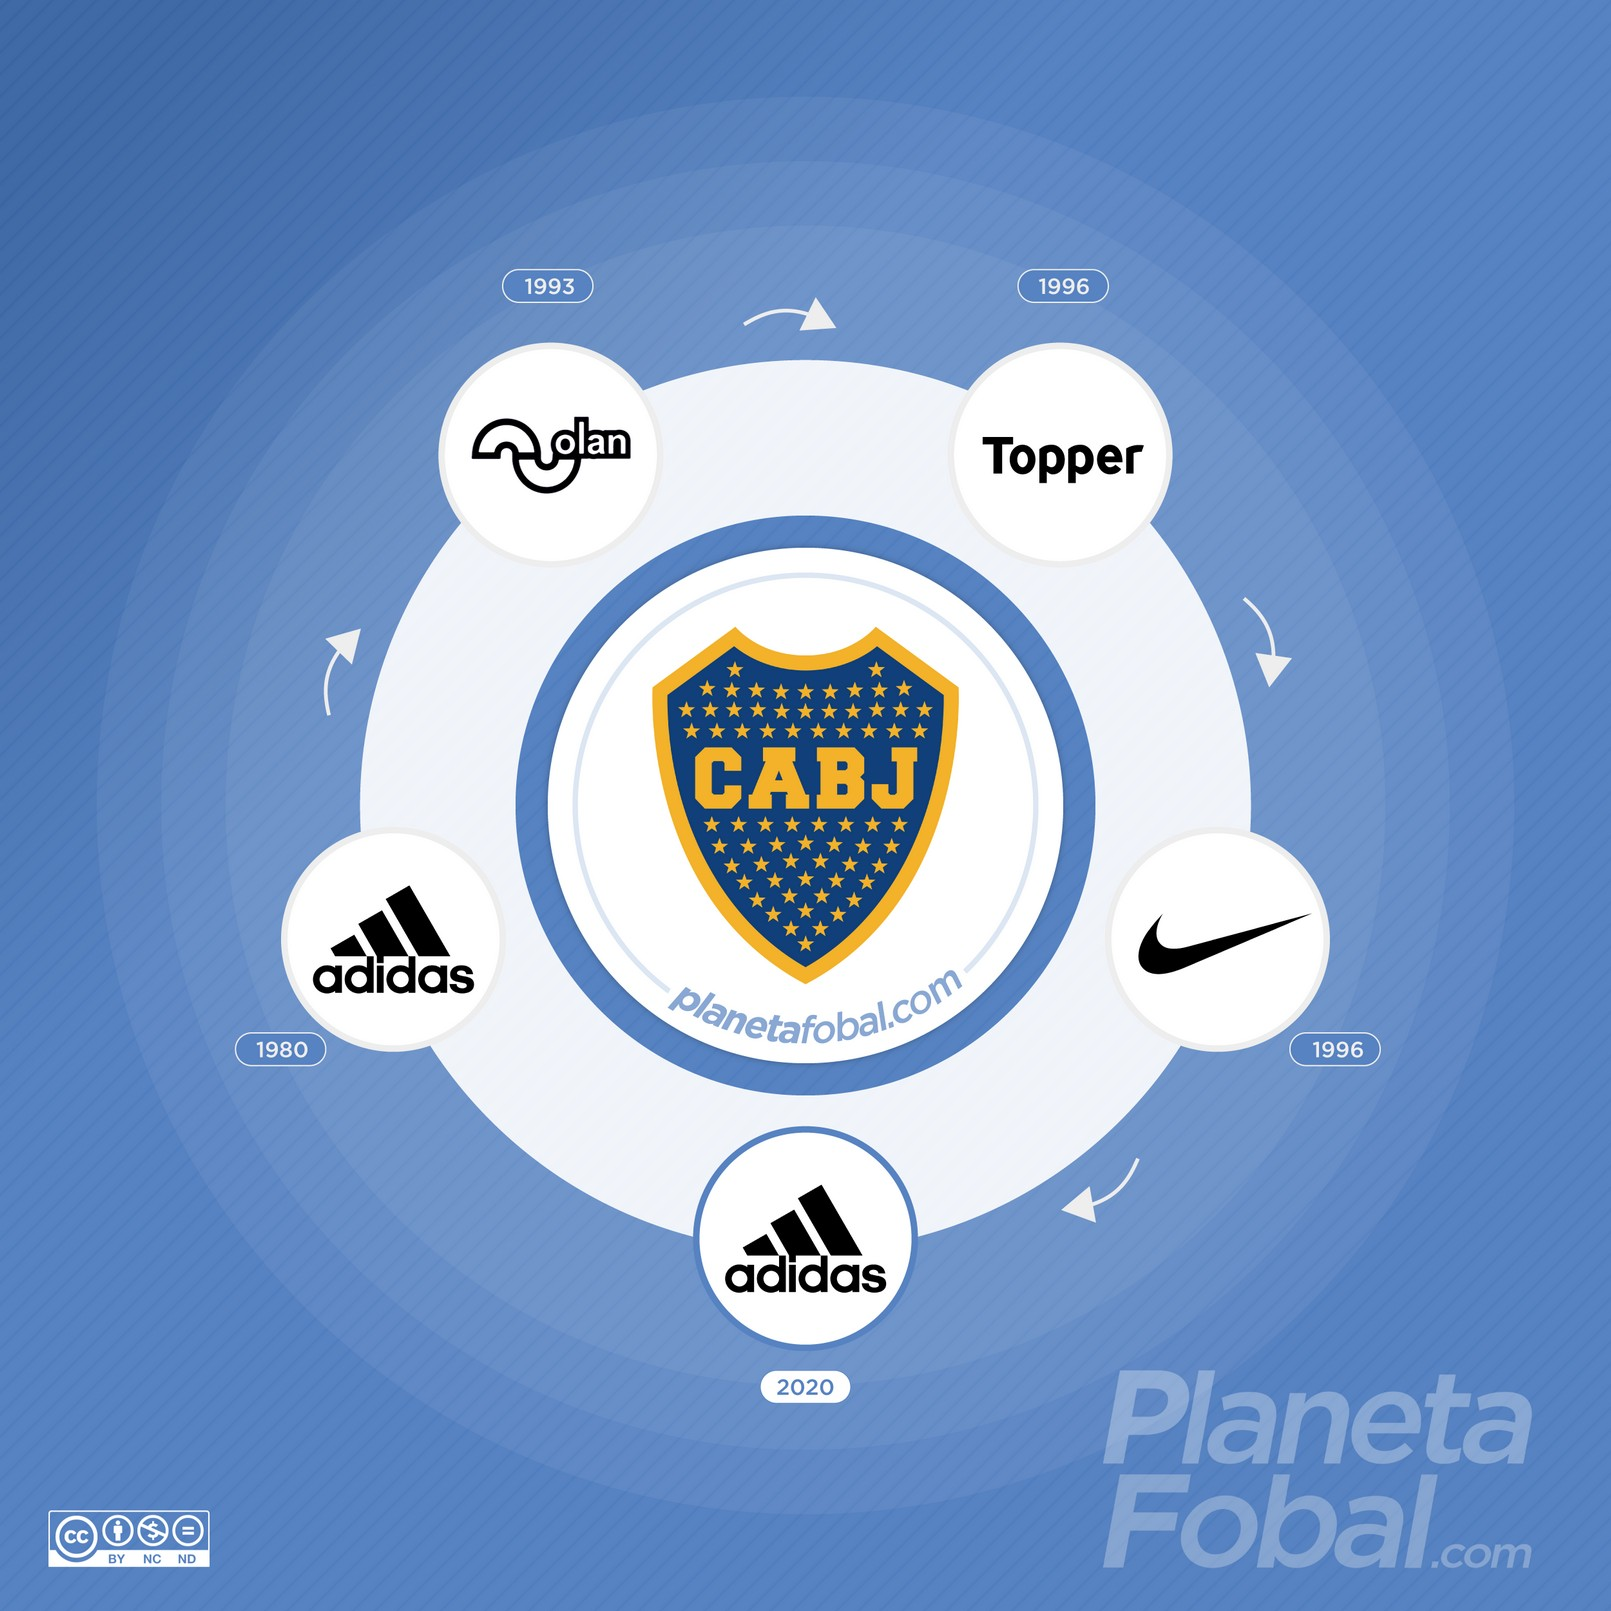 Marcas deportivas que vistieron a Boca Juniors de Argentina